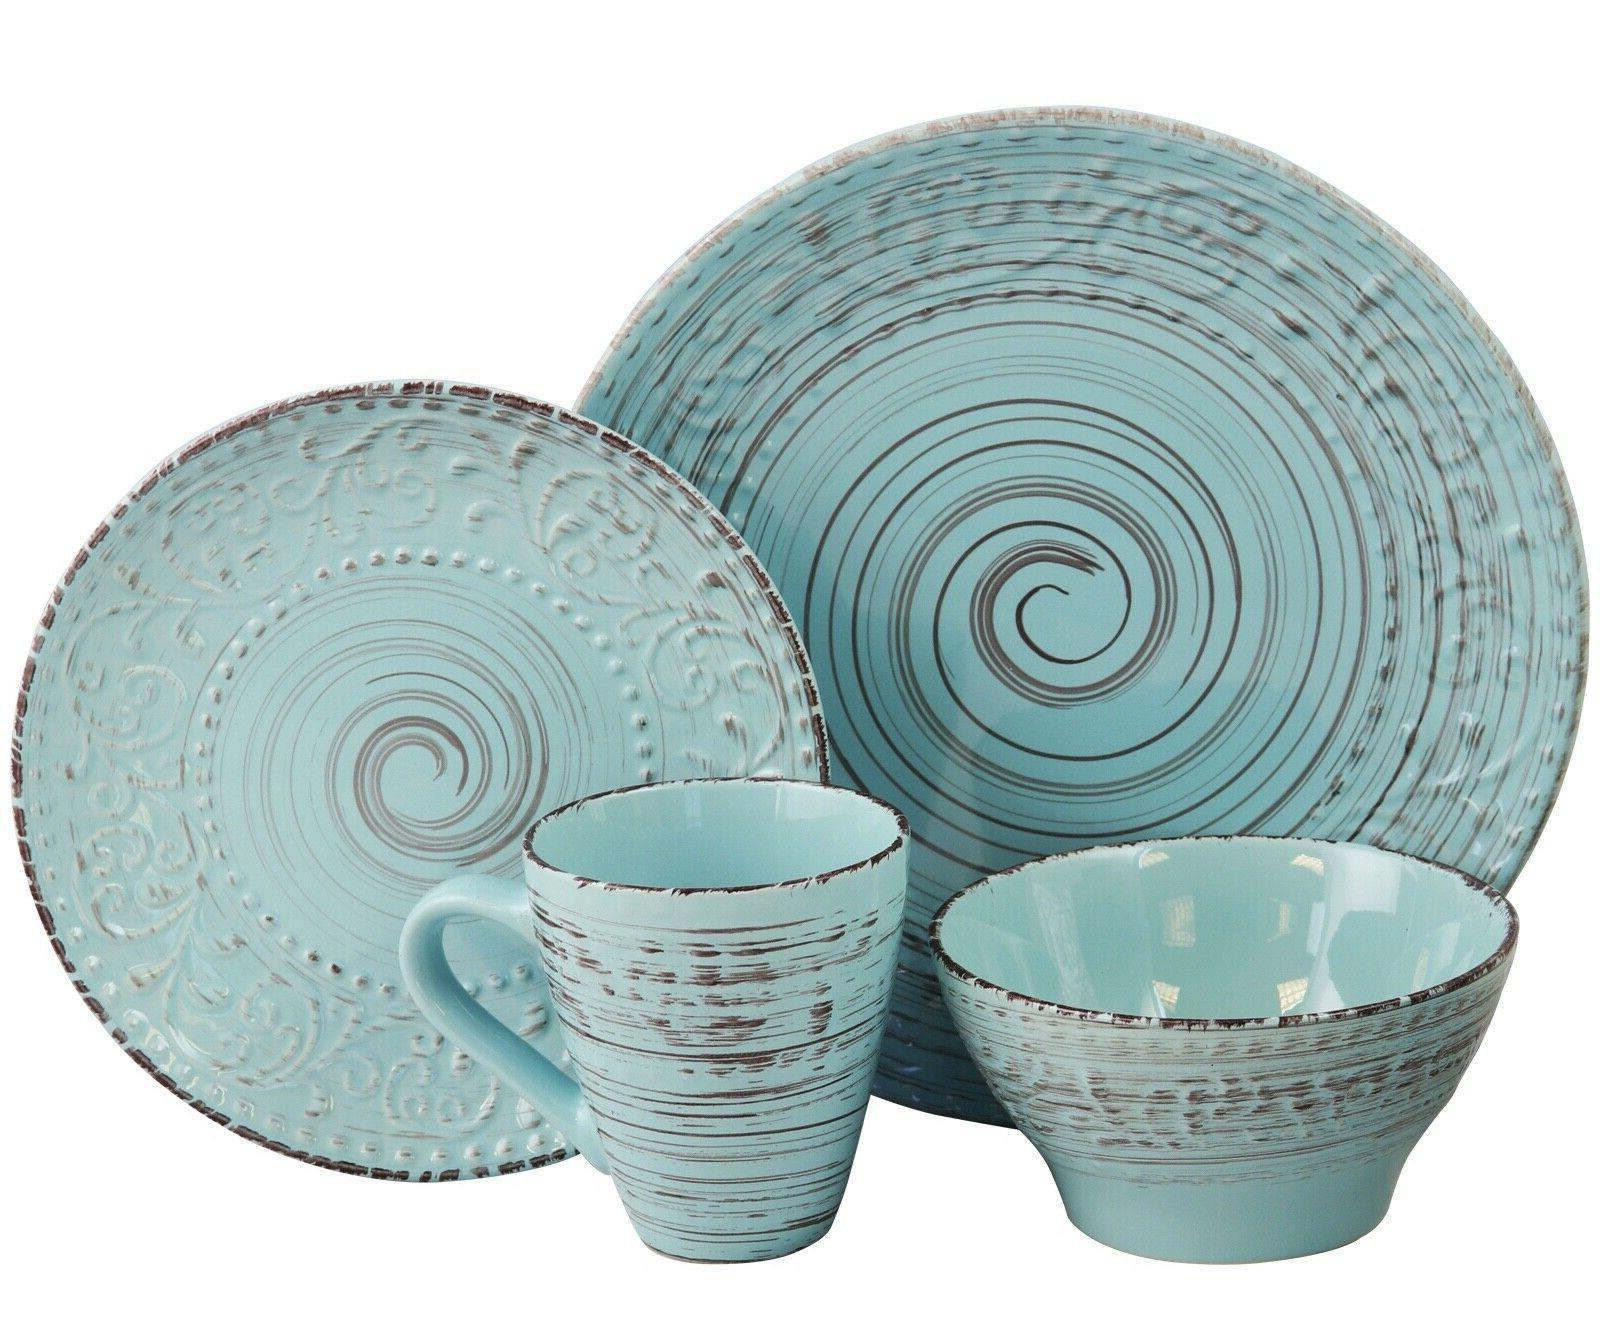 Malibu Set Dinnerware 16 Piece Dishes Plate Turquoise Vintage Service